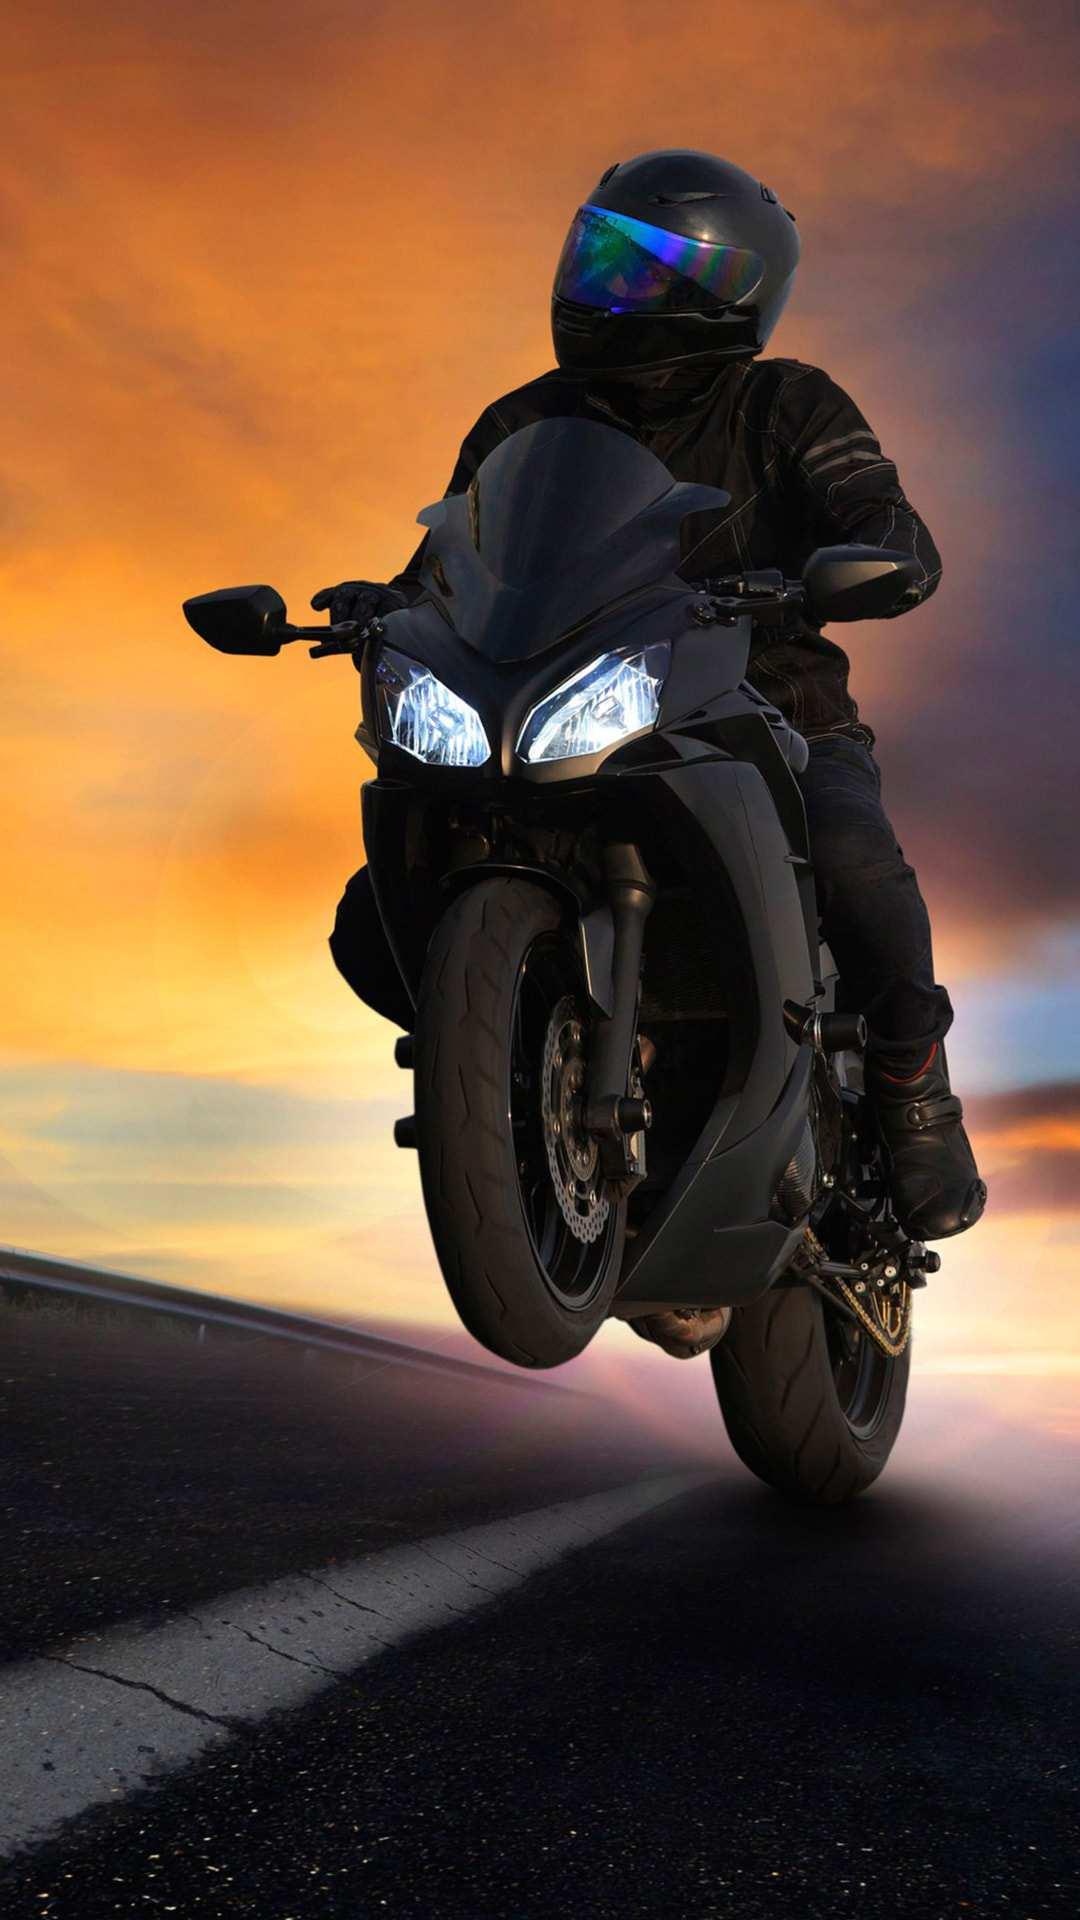 Kawasaki Superbike Black iPhone Wallpaper